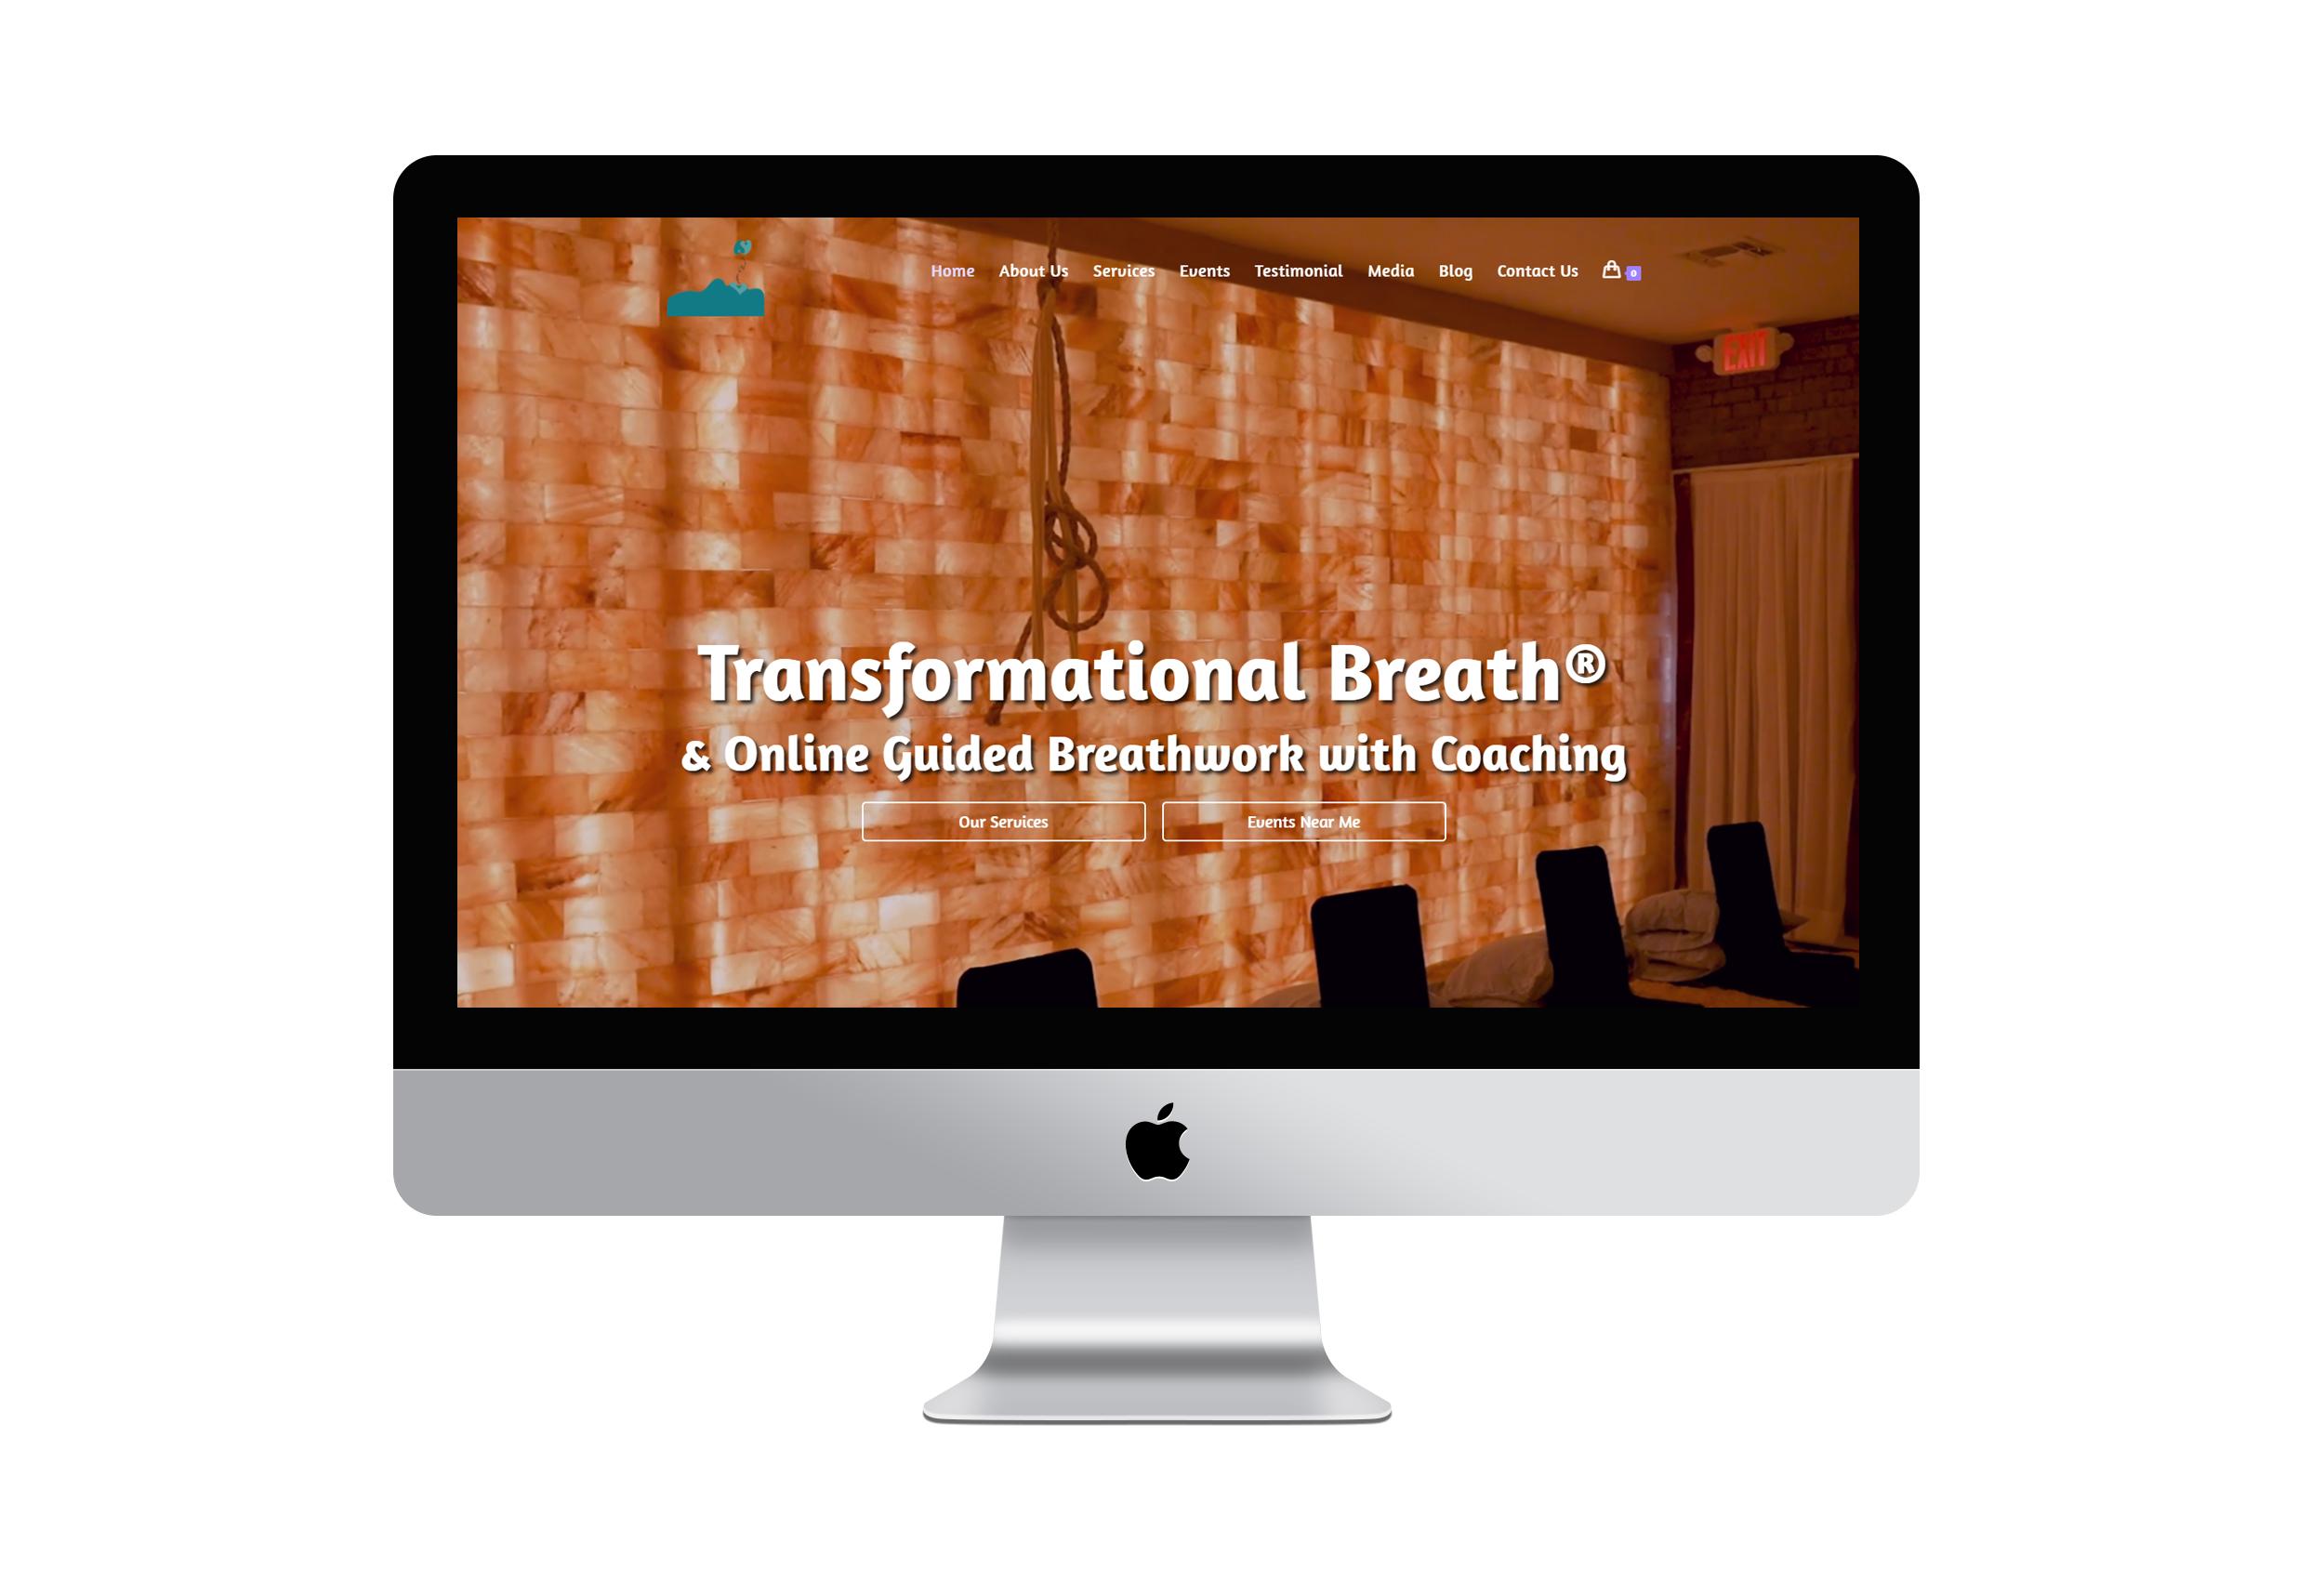 EveryDayEspo - Transformational Breath Website